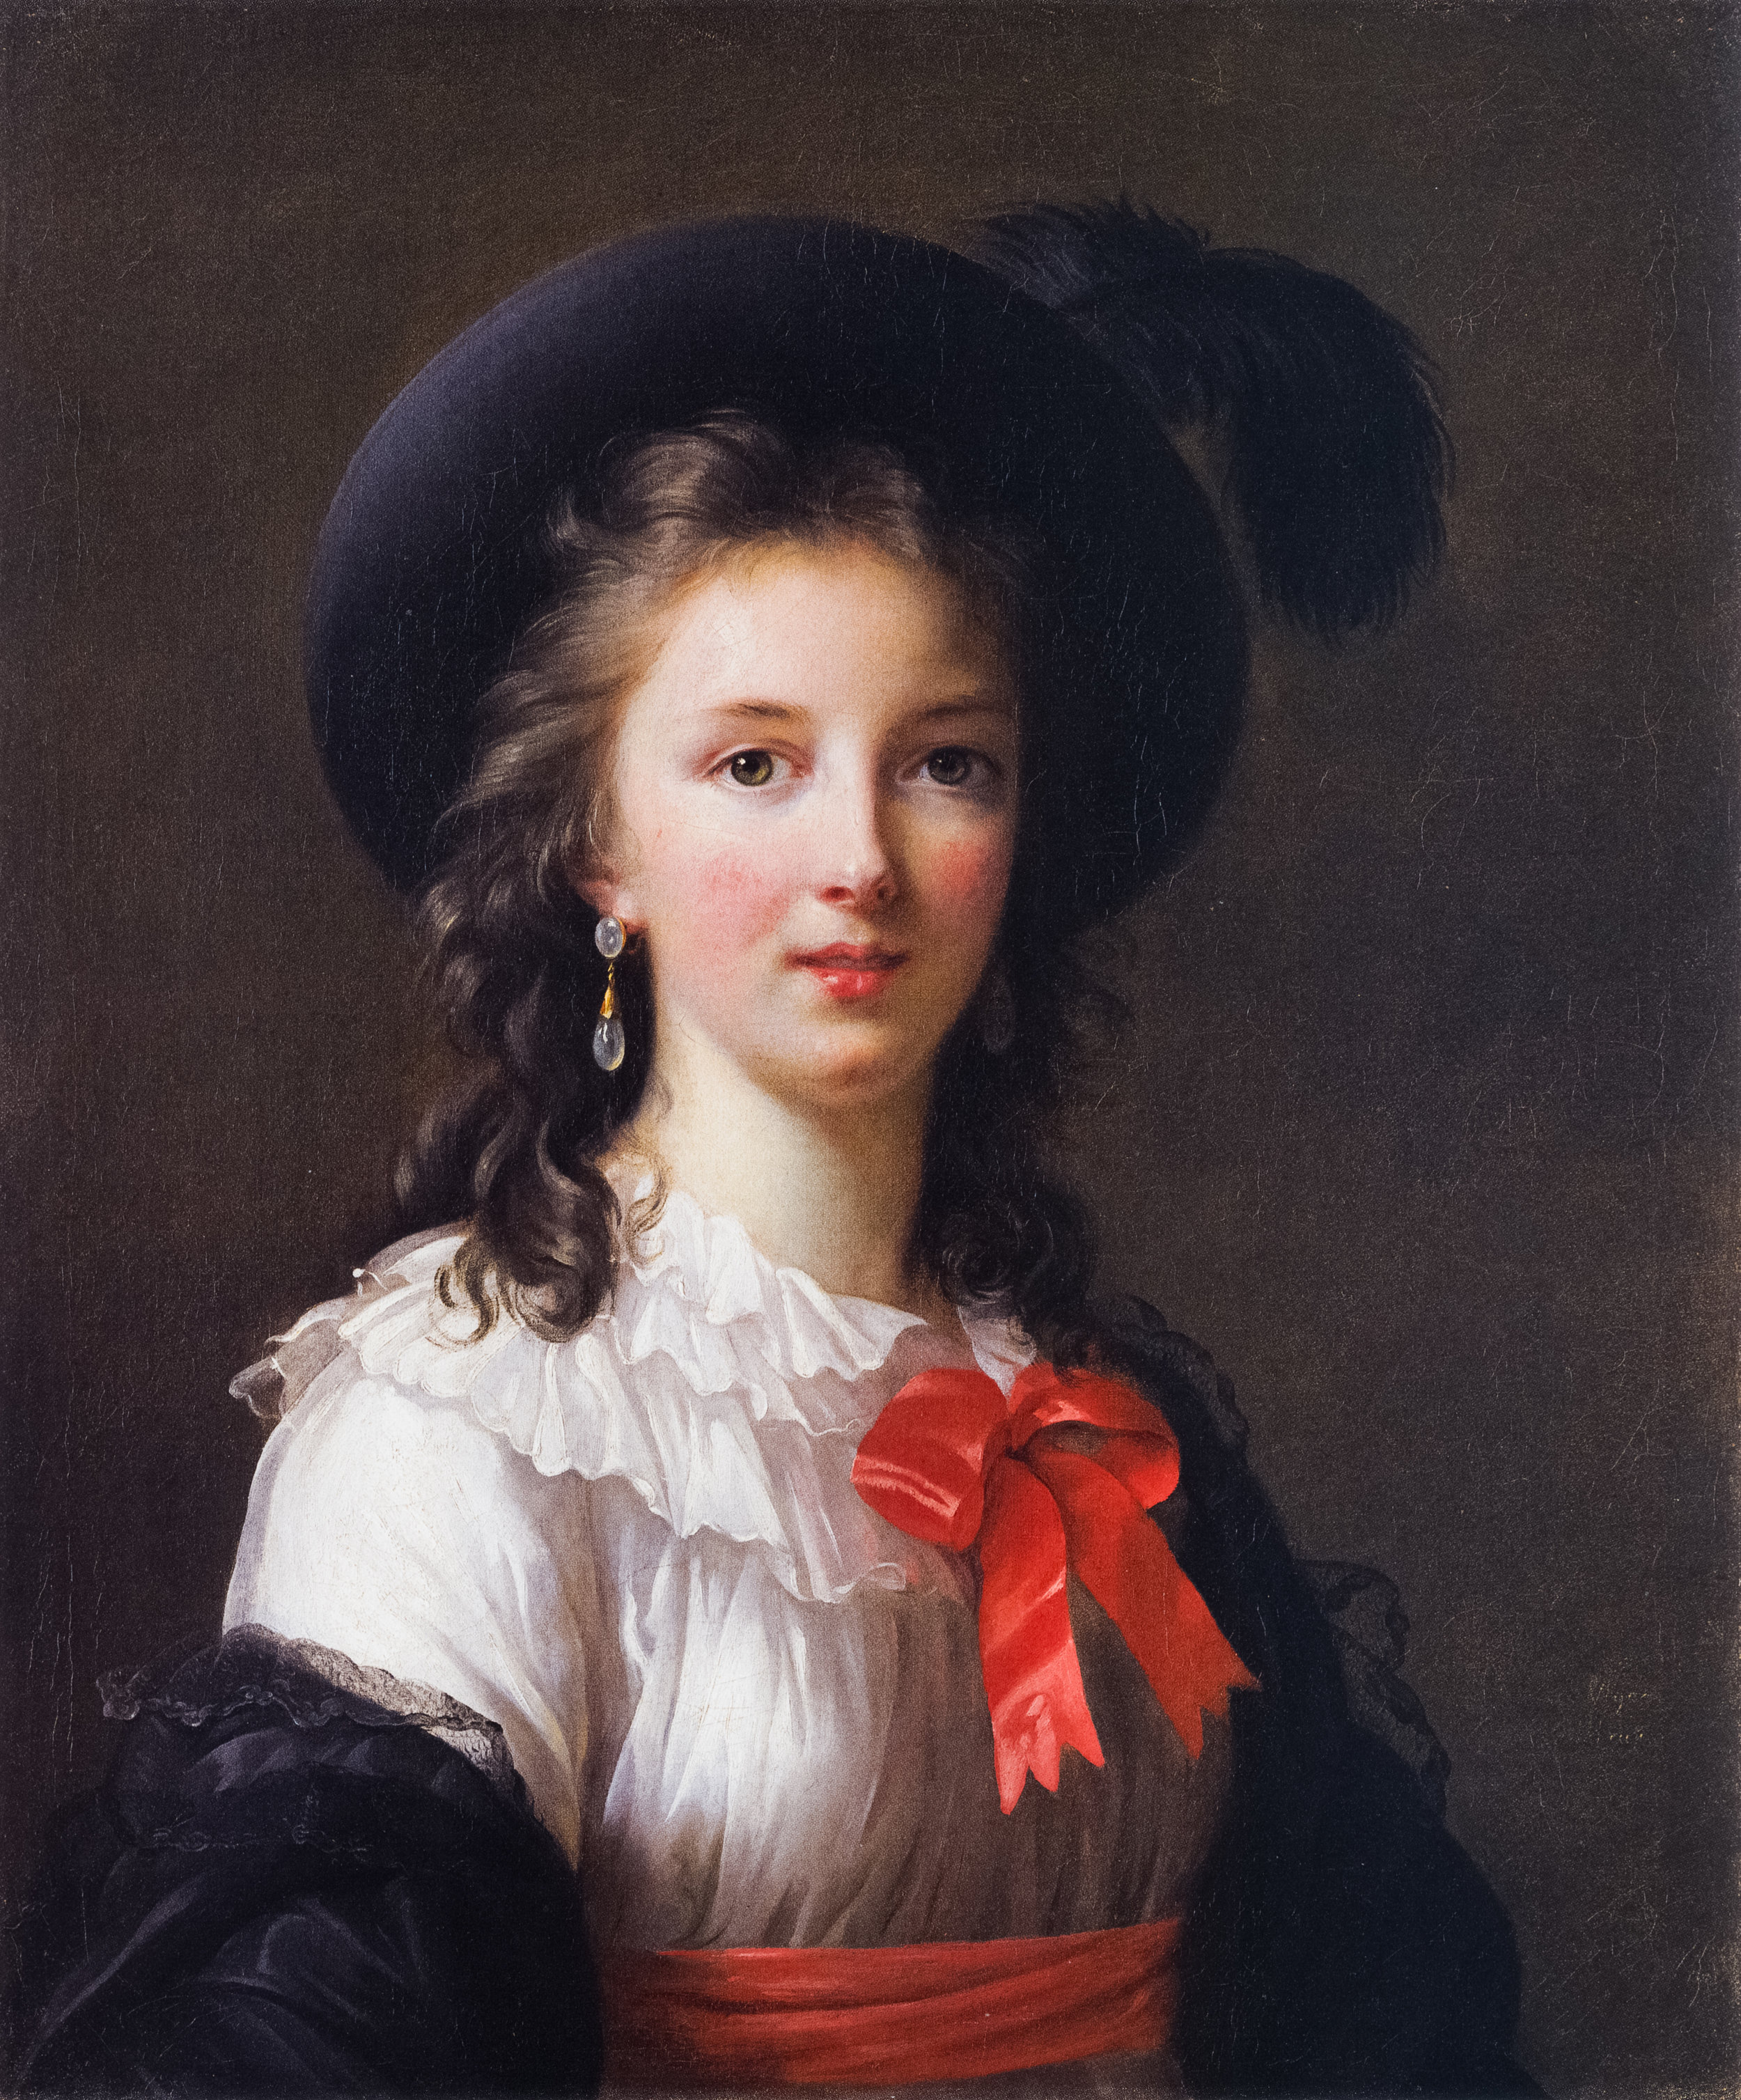 Elisabeth Vigée Lebrun, Self-Portrait, circa 1781-1782, oil on canvas, Kimbell Art Museum